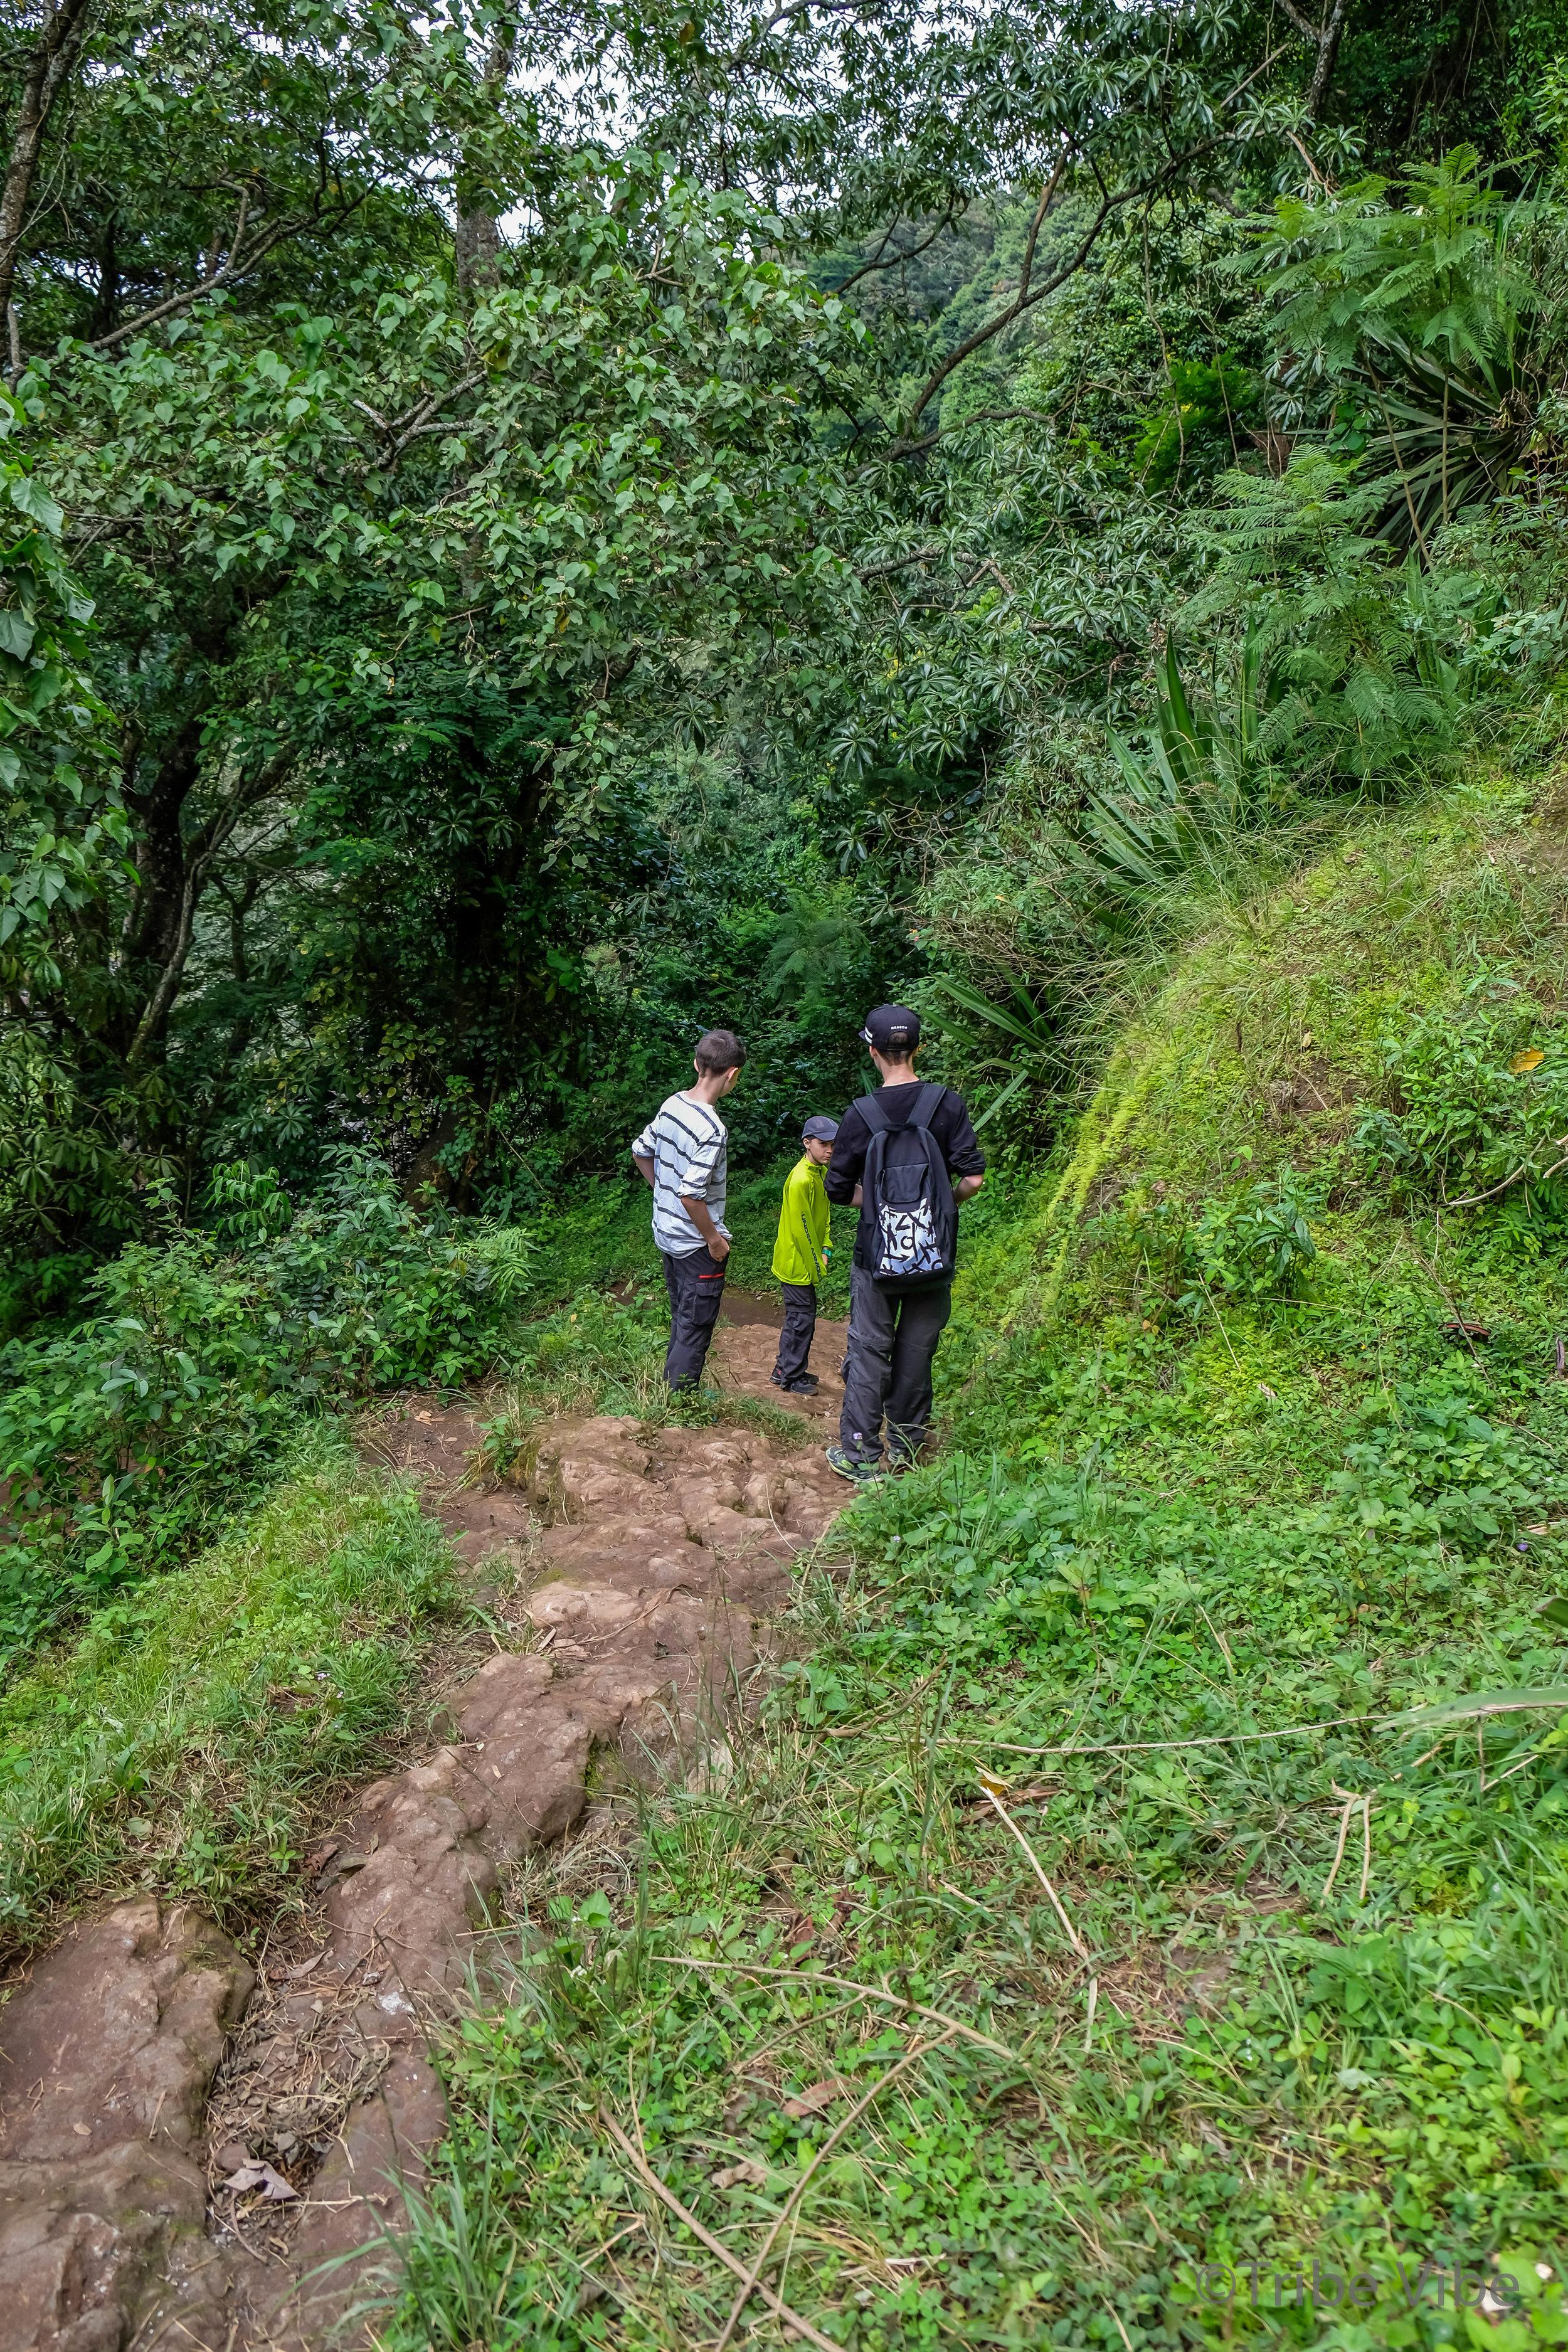 Machame walking trail to the bridge 2, Kilimanjaro.jpg